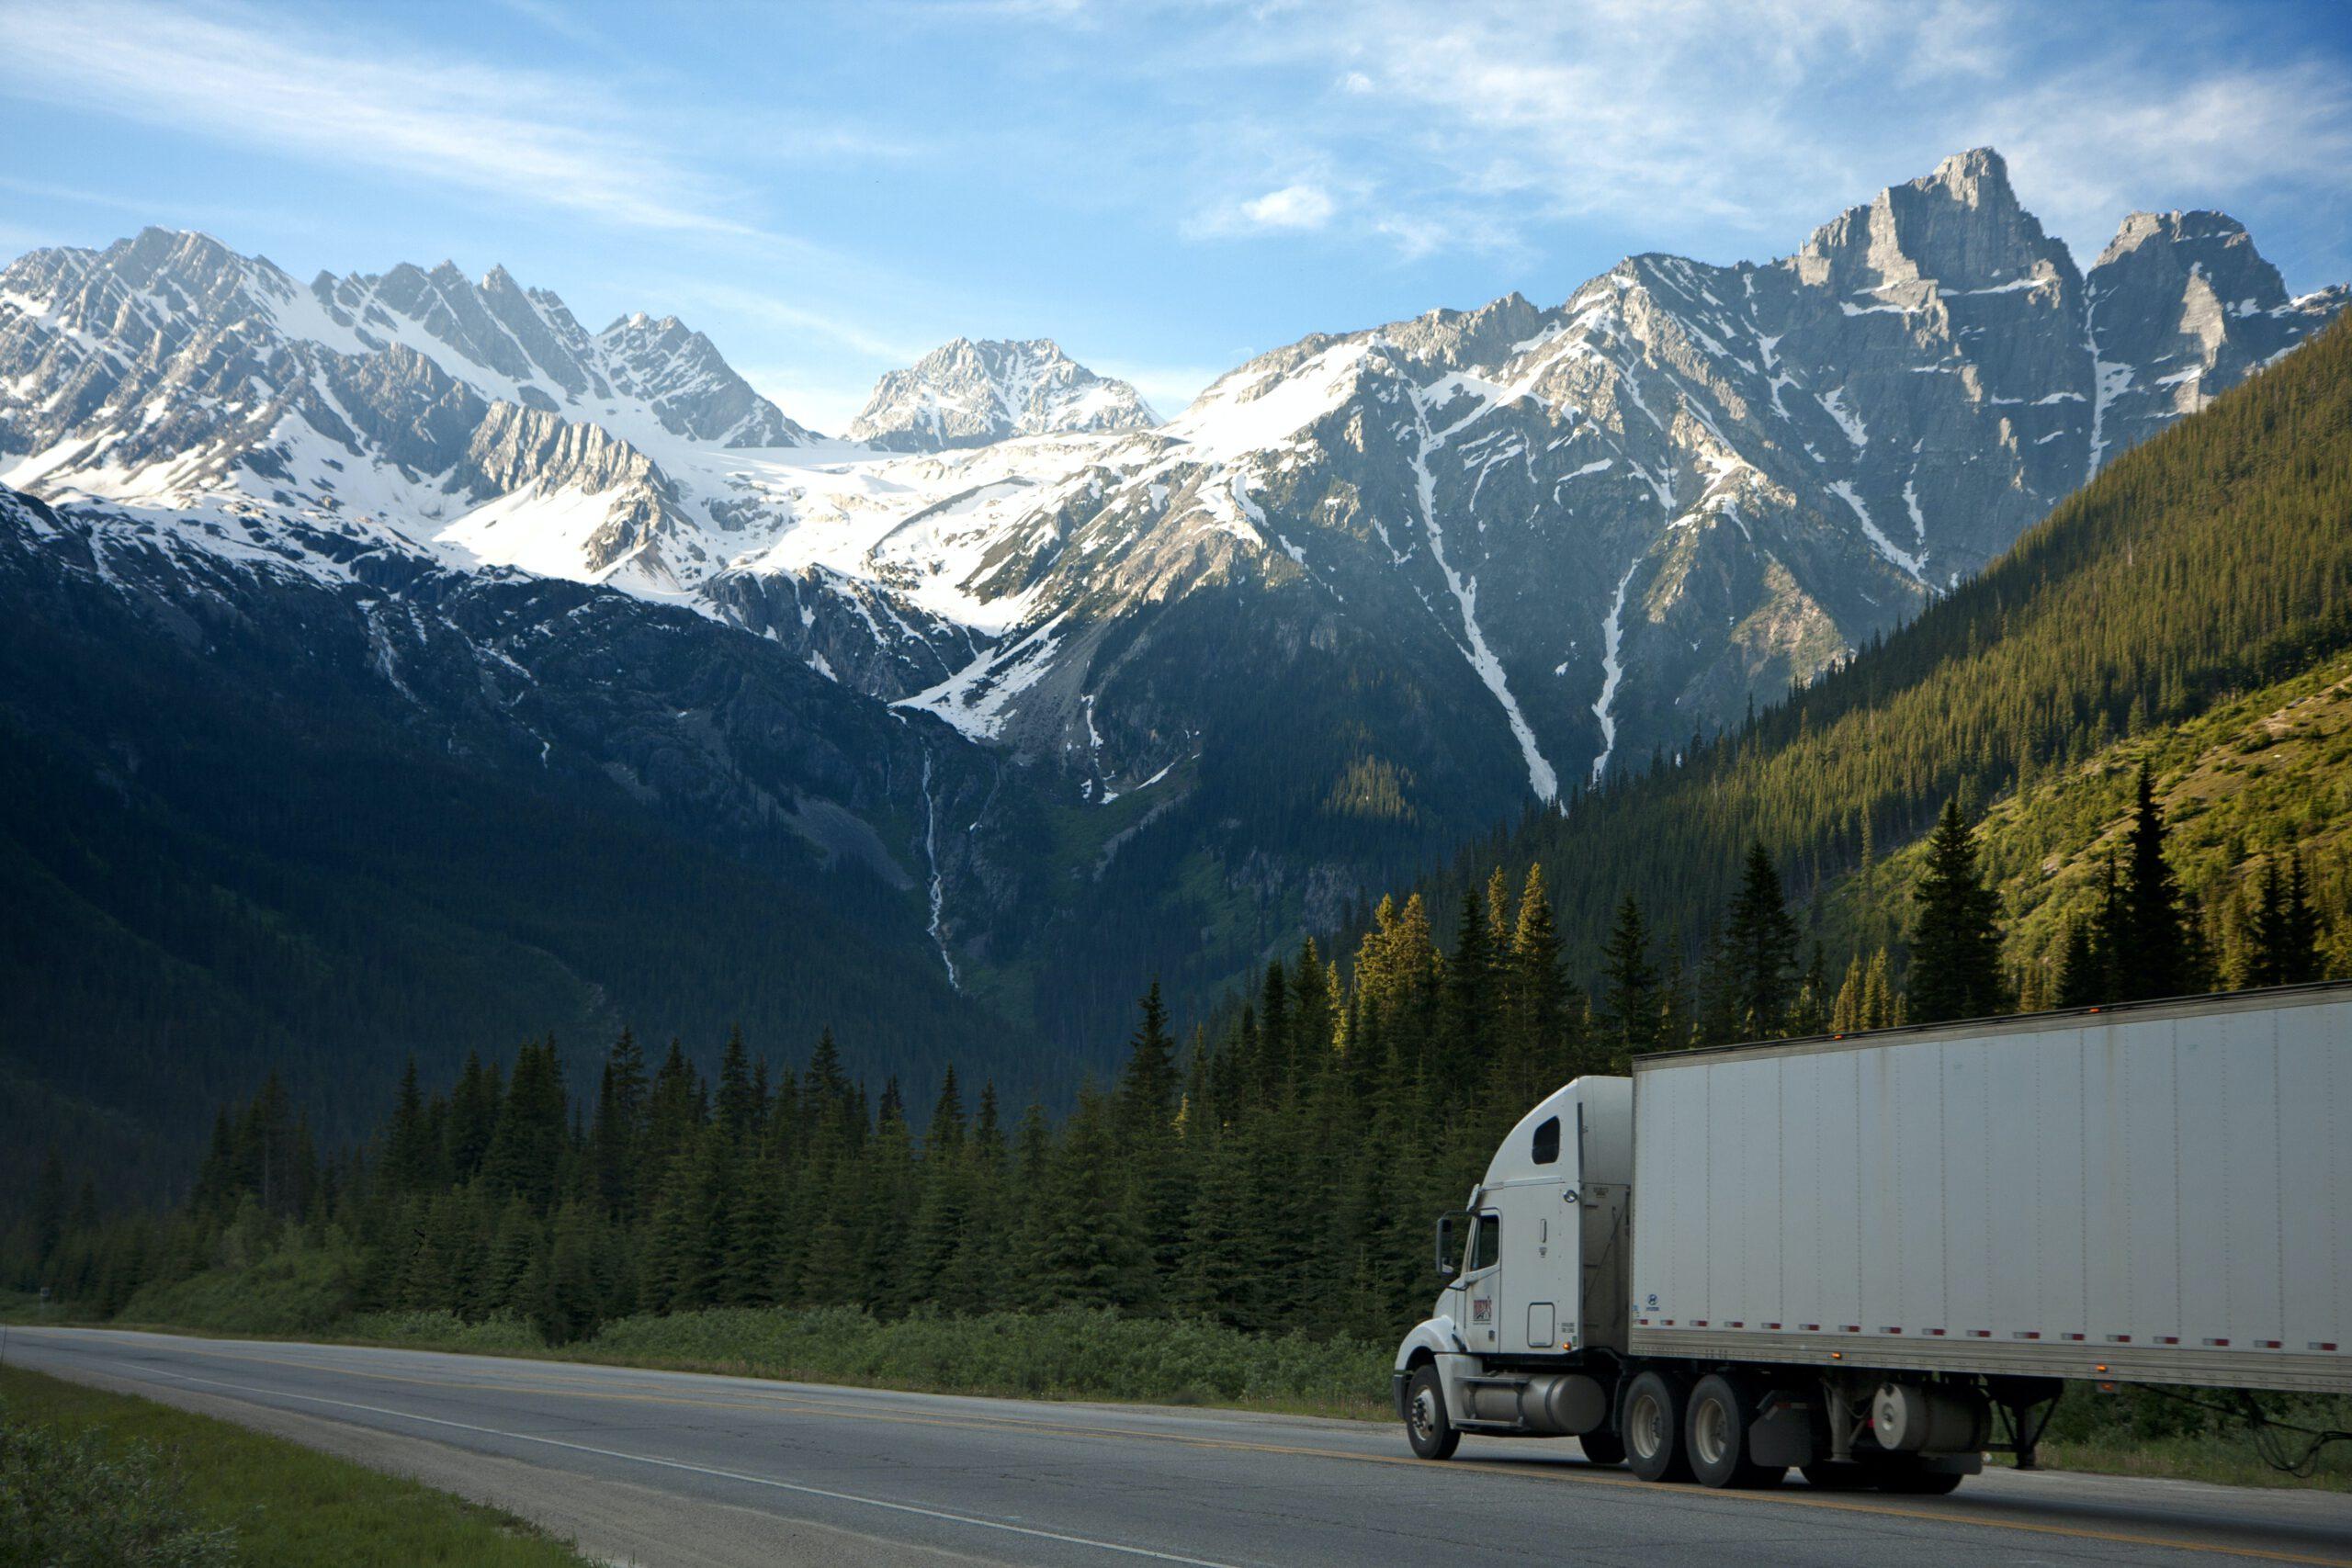 white-dump-truck-near-pine-tress-during-daytime-93398